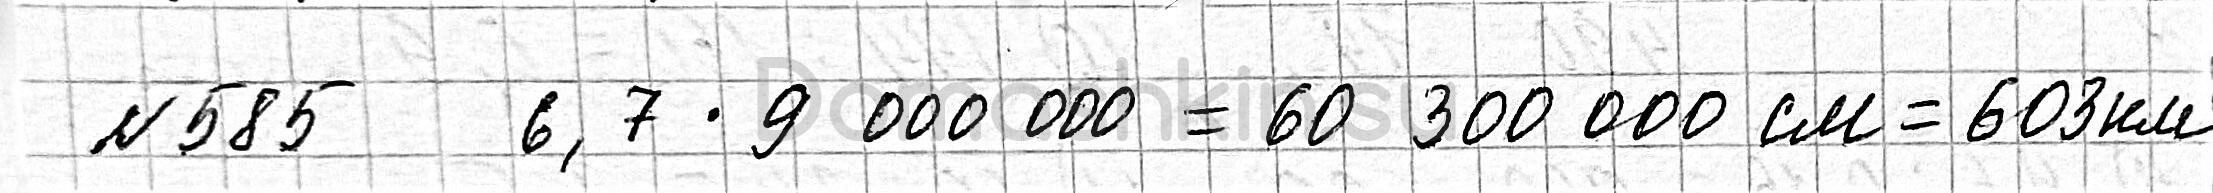 Математика 6 класс учебник Мерзляк номер 585 решение